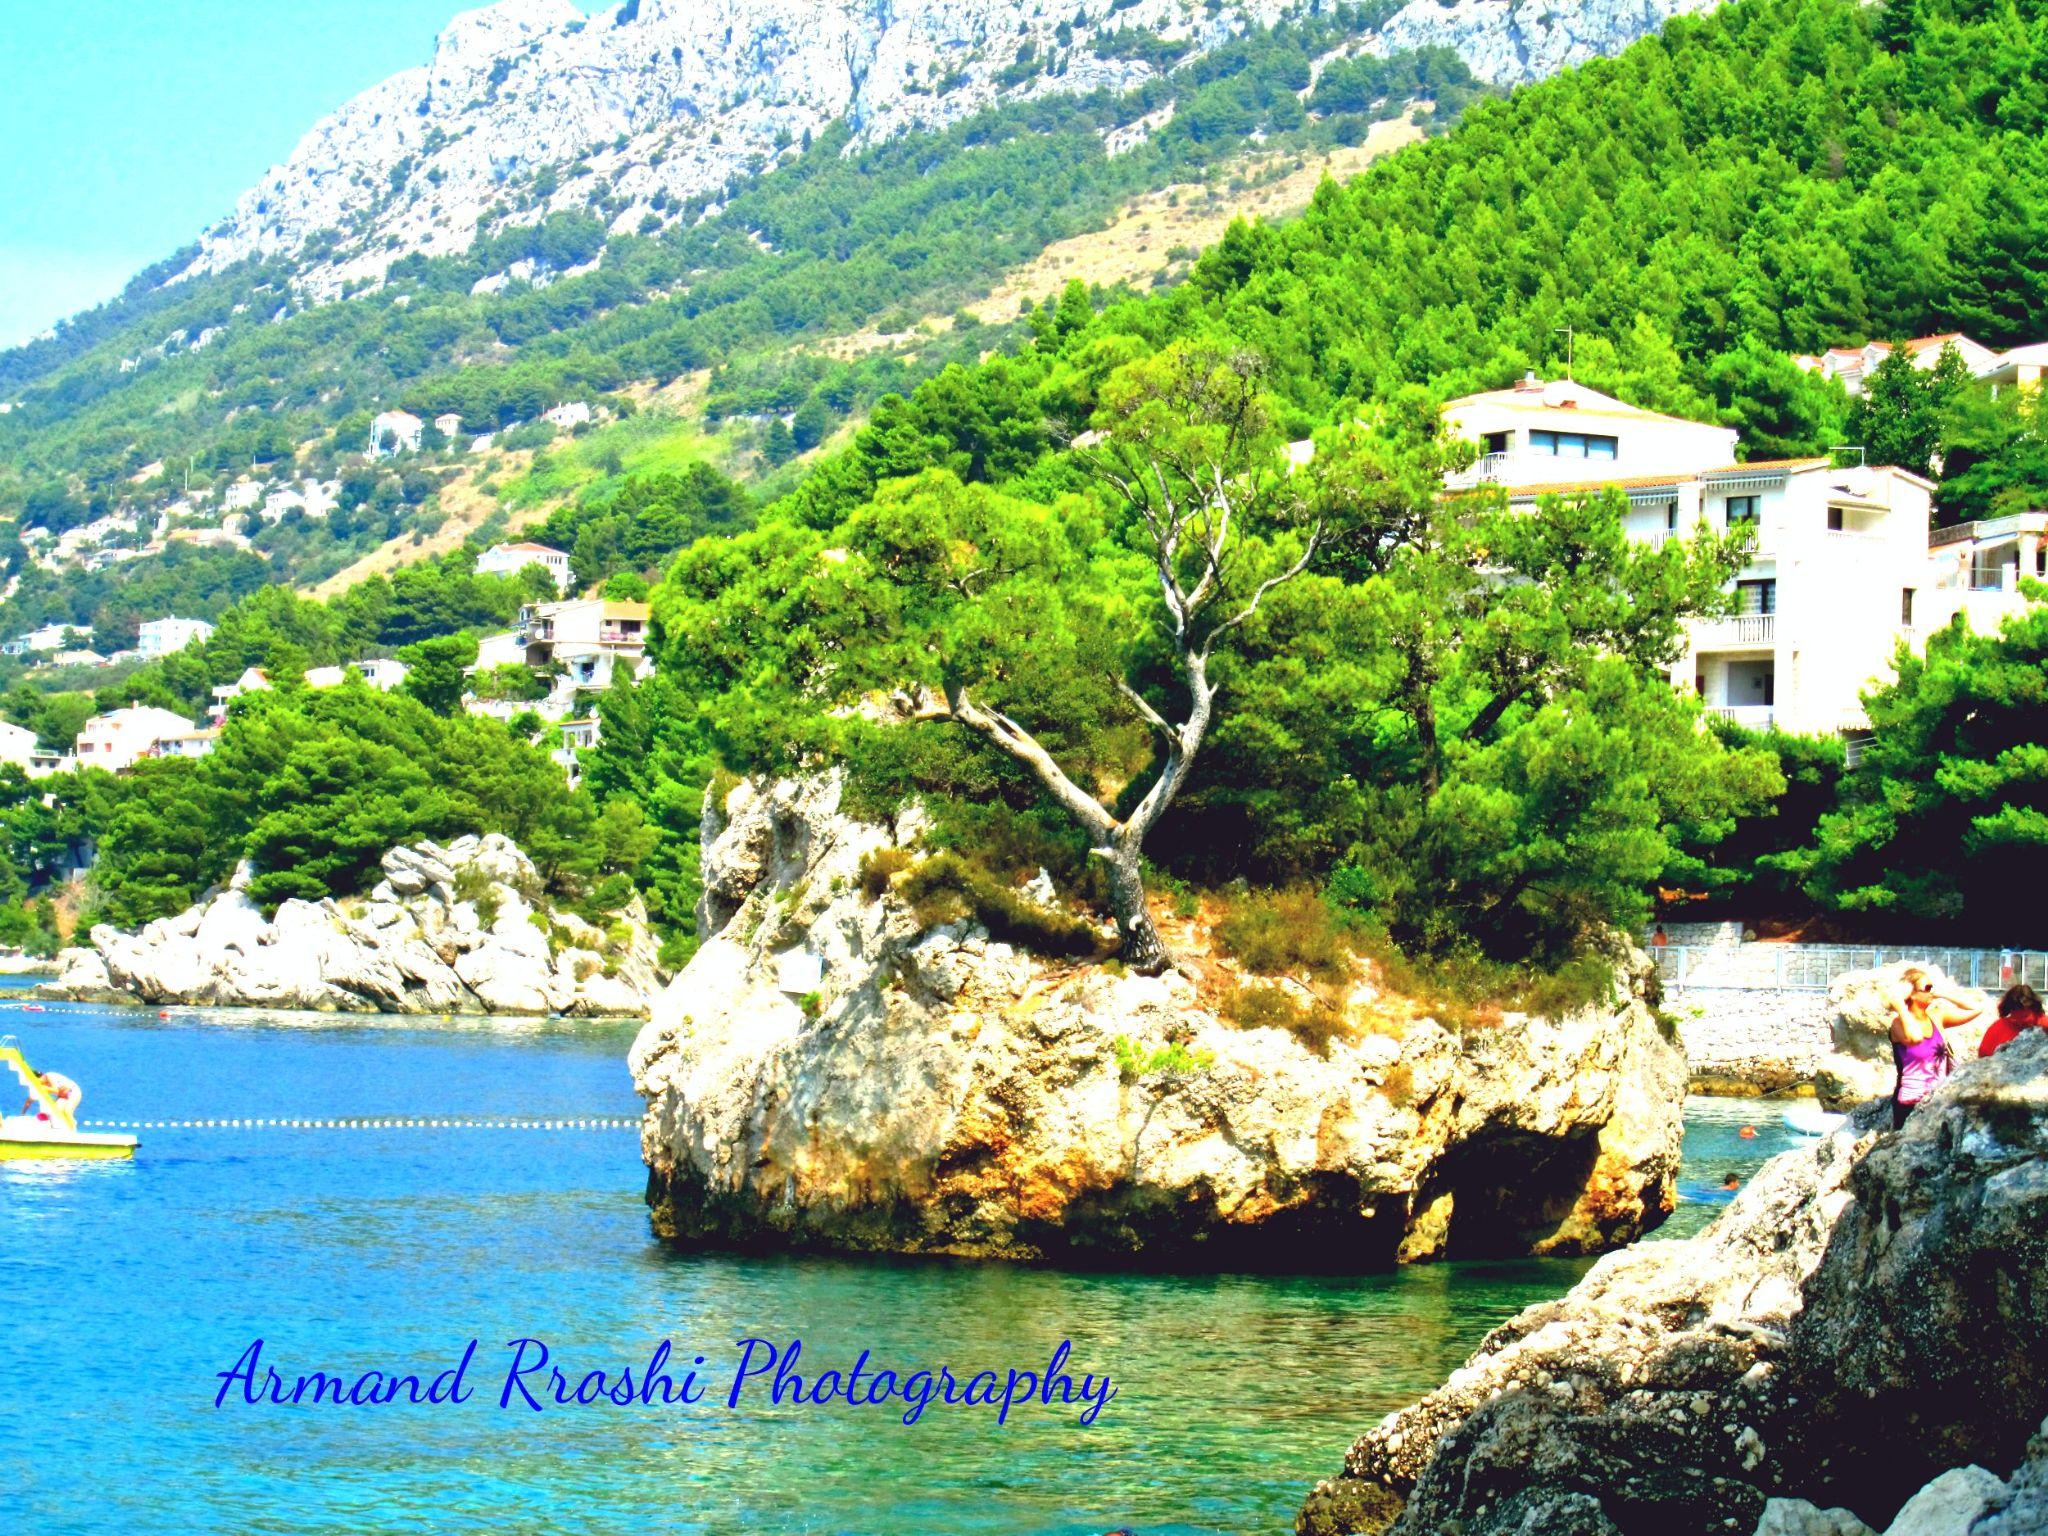 Beach of Brela, Croatia by Armand Rroshi